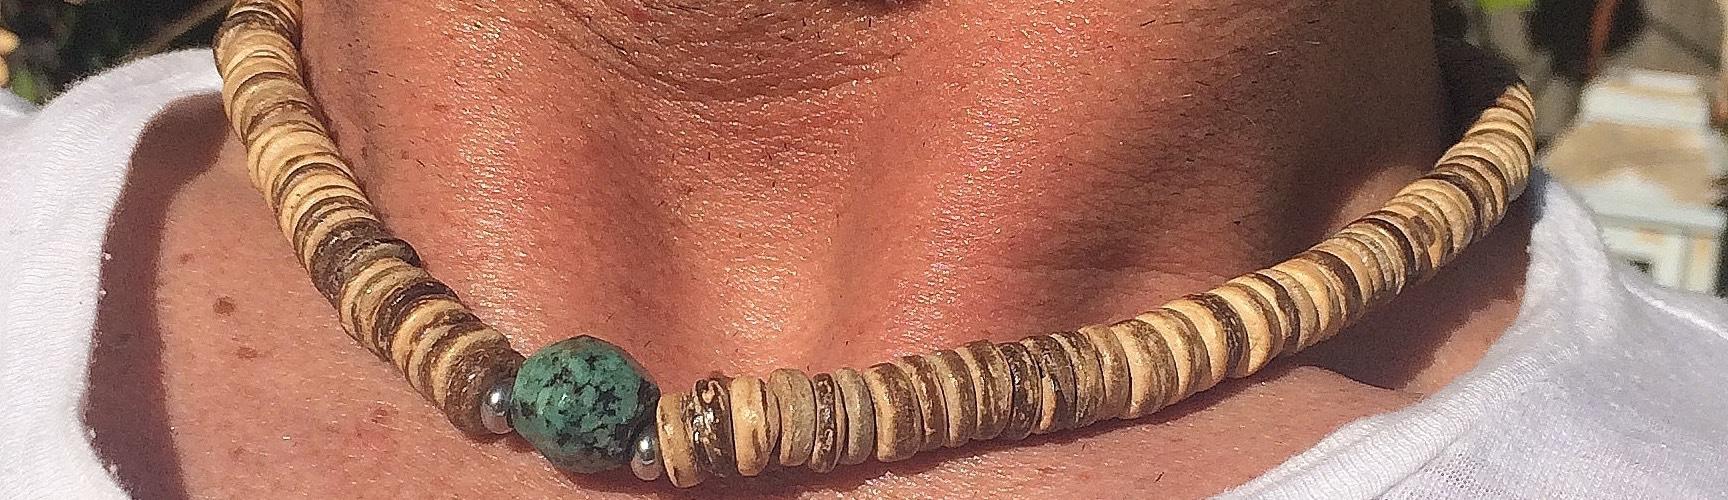 kokosdisc met Turkoois ketting